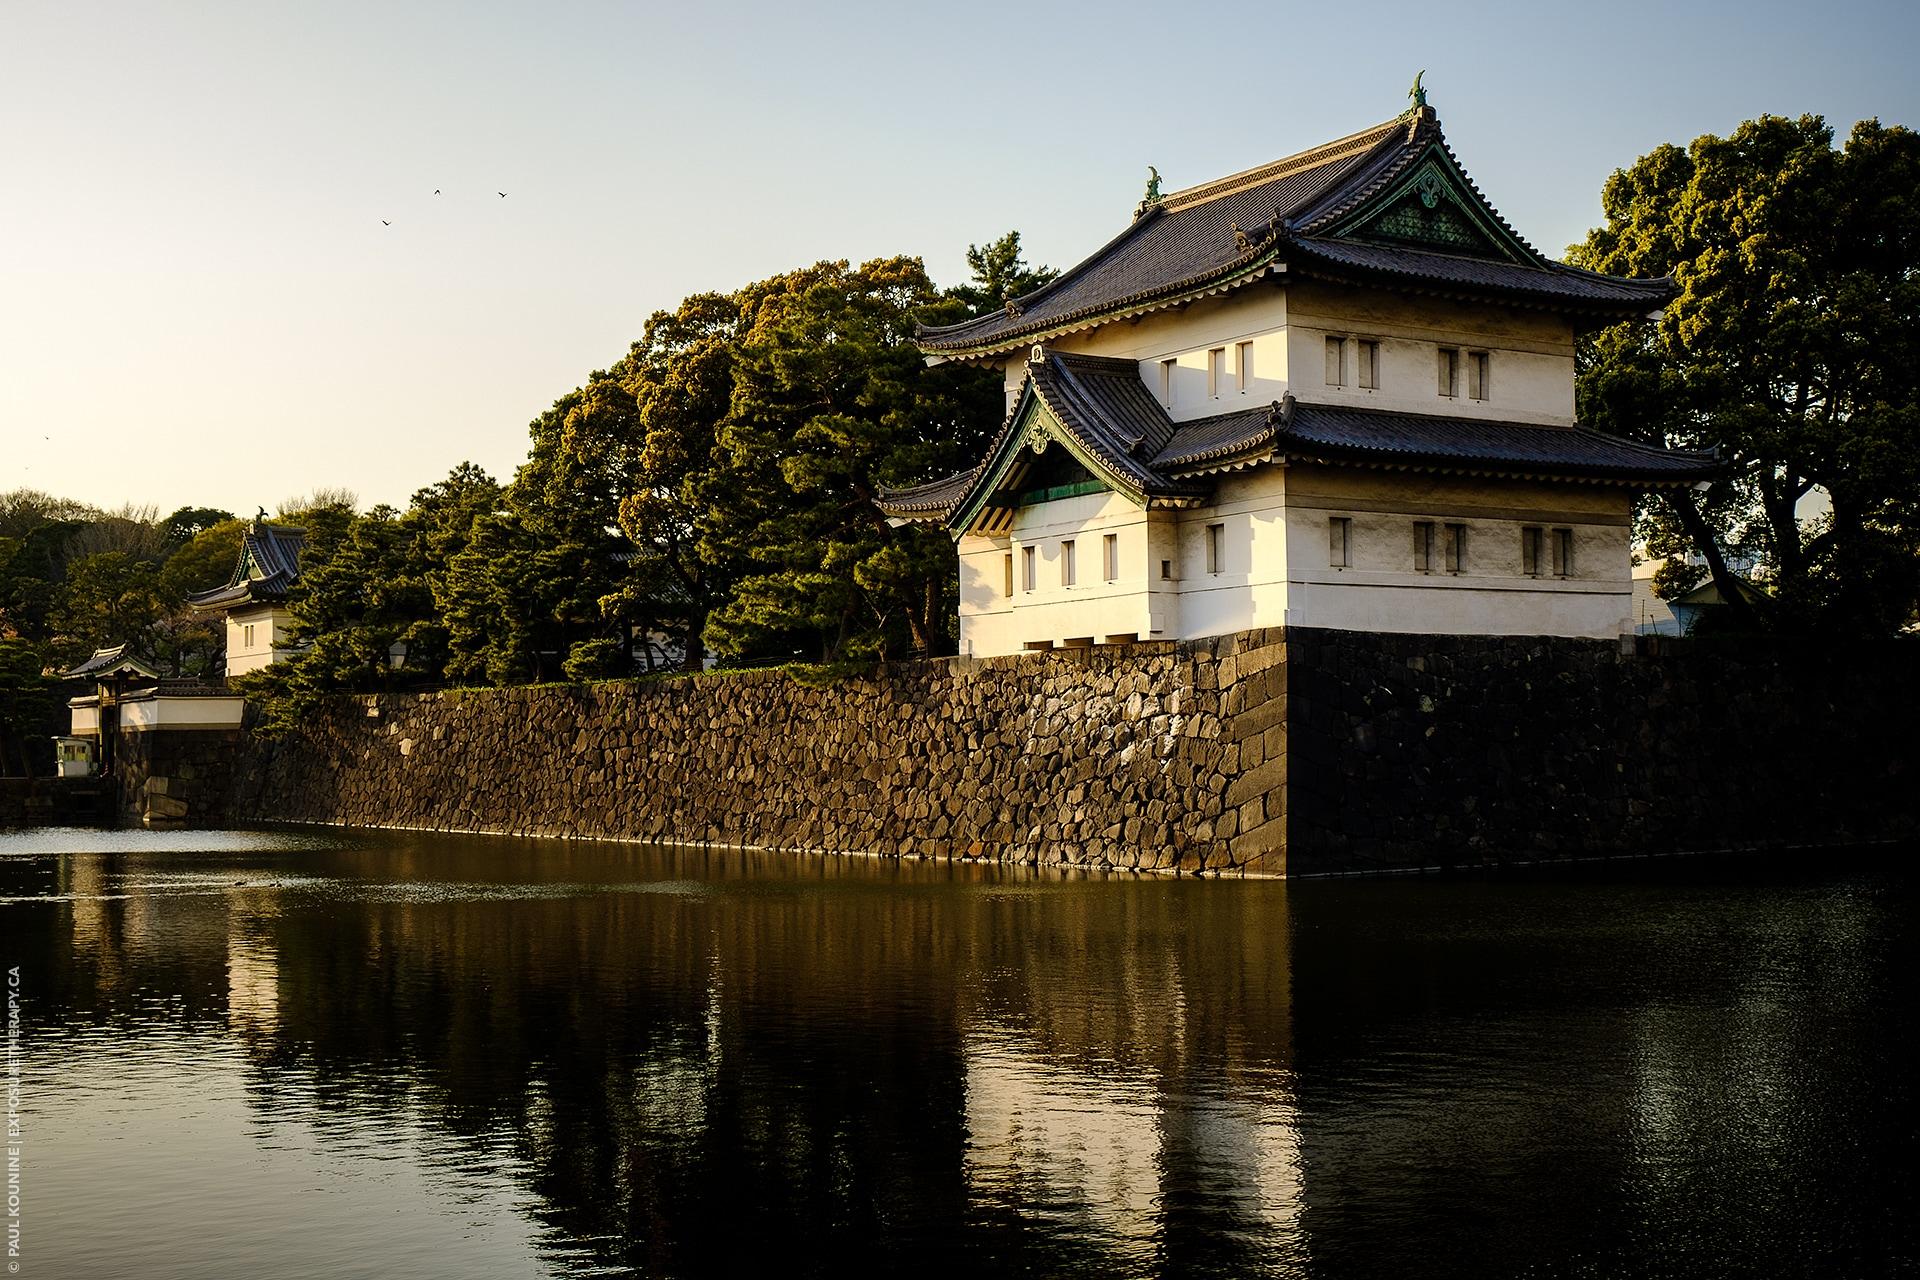 Normal focal length lens on APS-C format Tokyo Imperial Palae